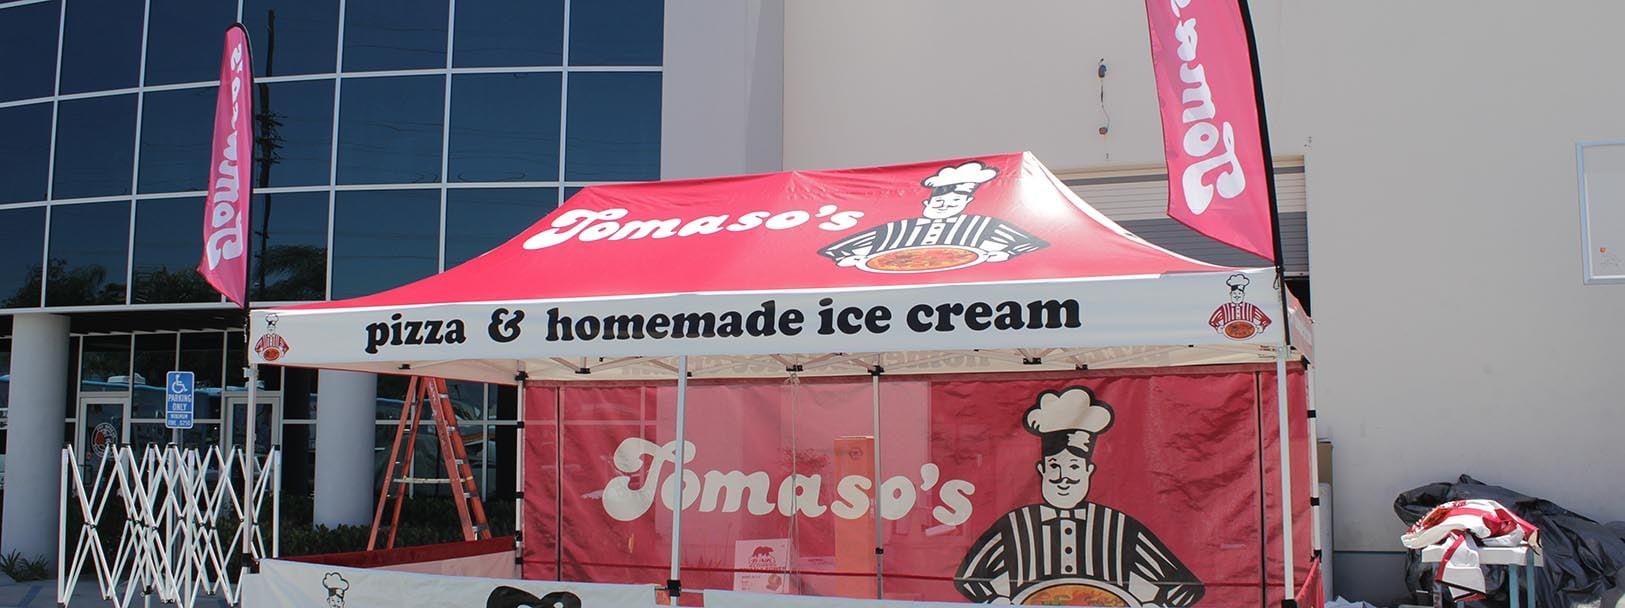 tomasos-pizza-ice-cream-header.jpg